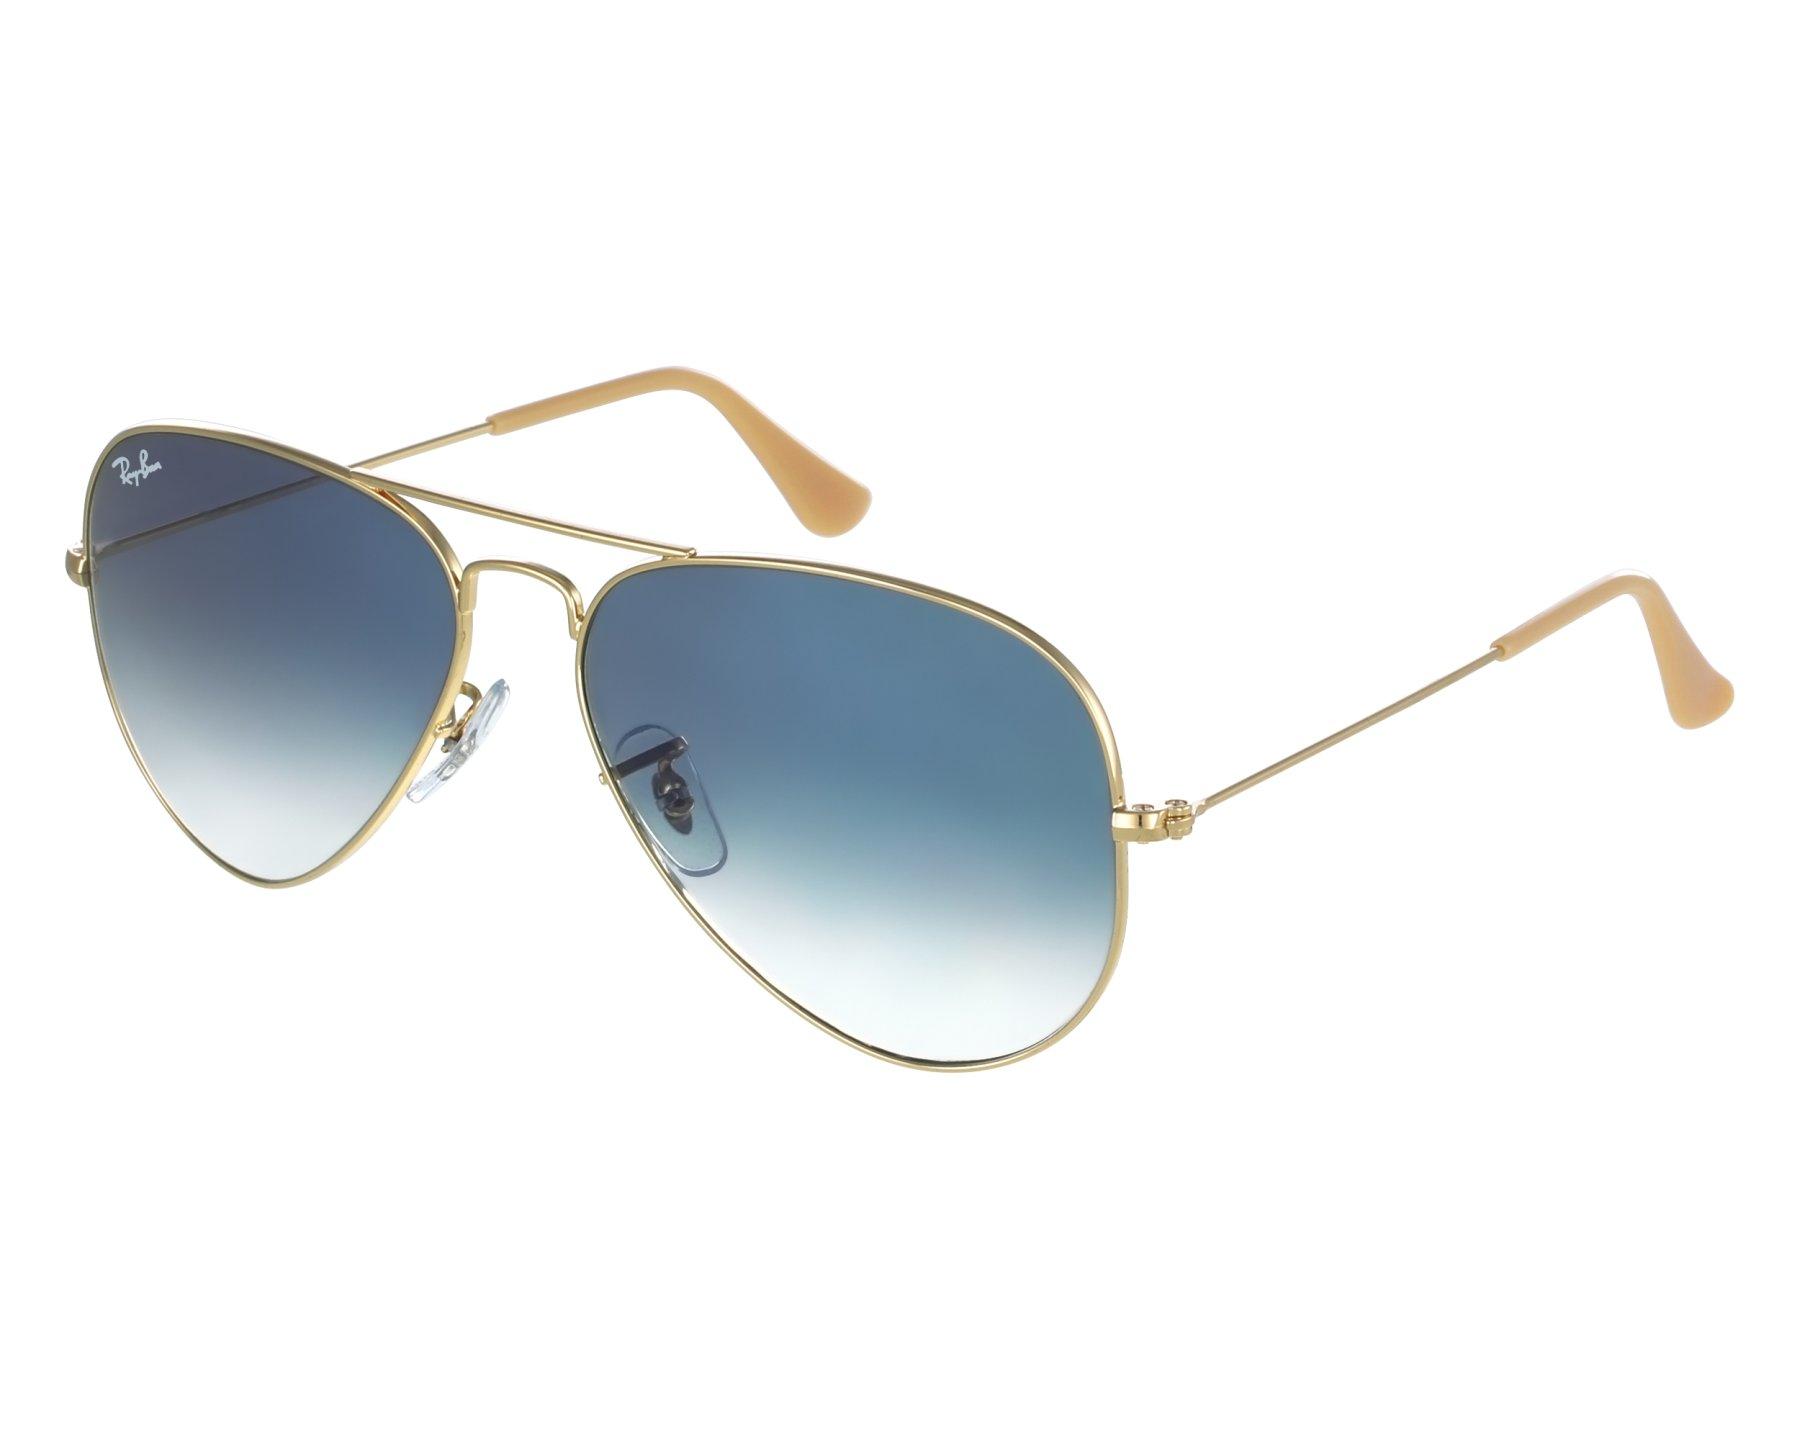 2061a1197e8e Sunglasses Ray-Ban RB-3025 001/3F 55-14 Gold front view